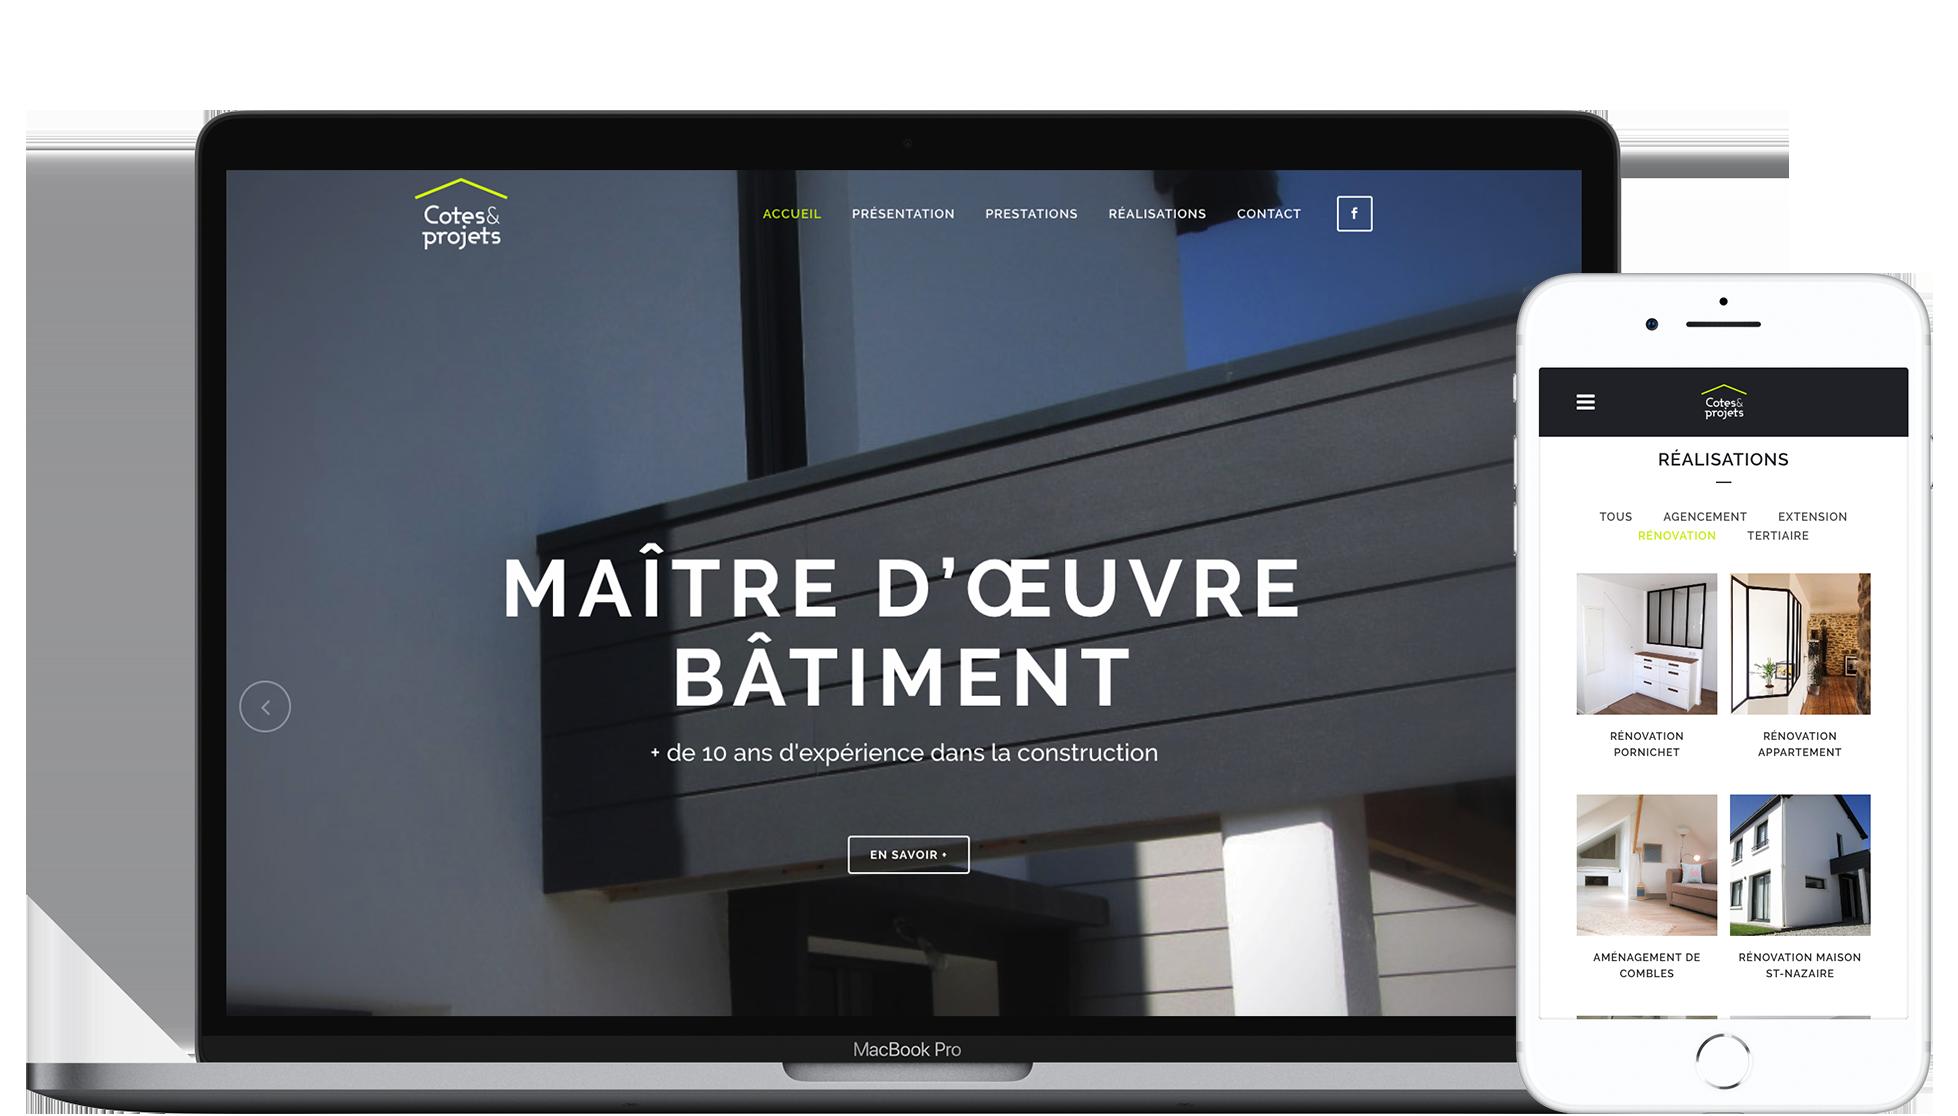 Cotesetprojets Saint-Nazaire